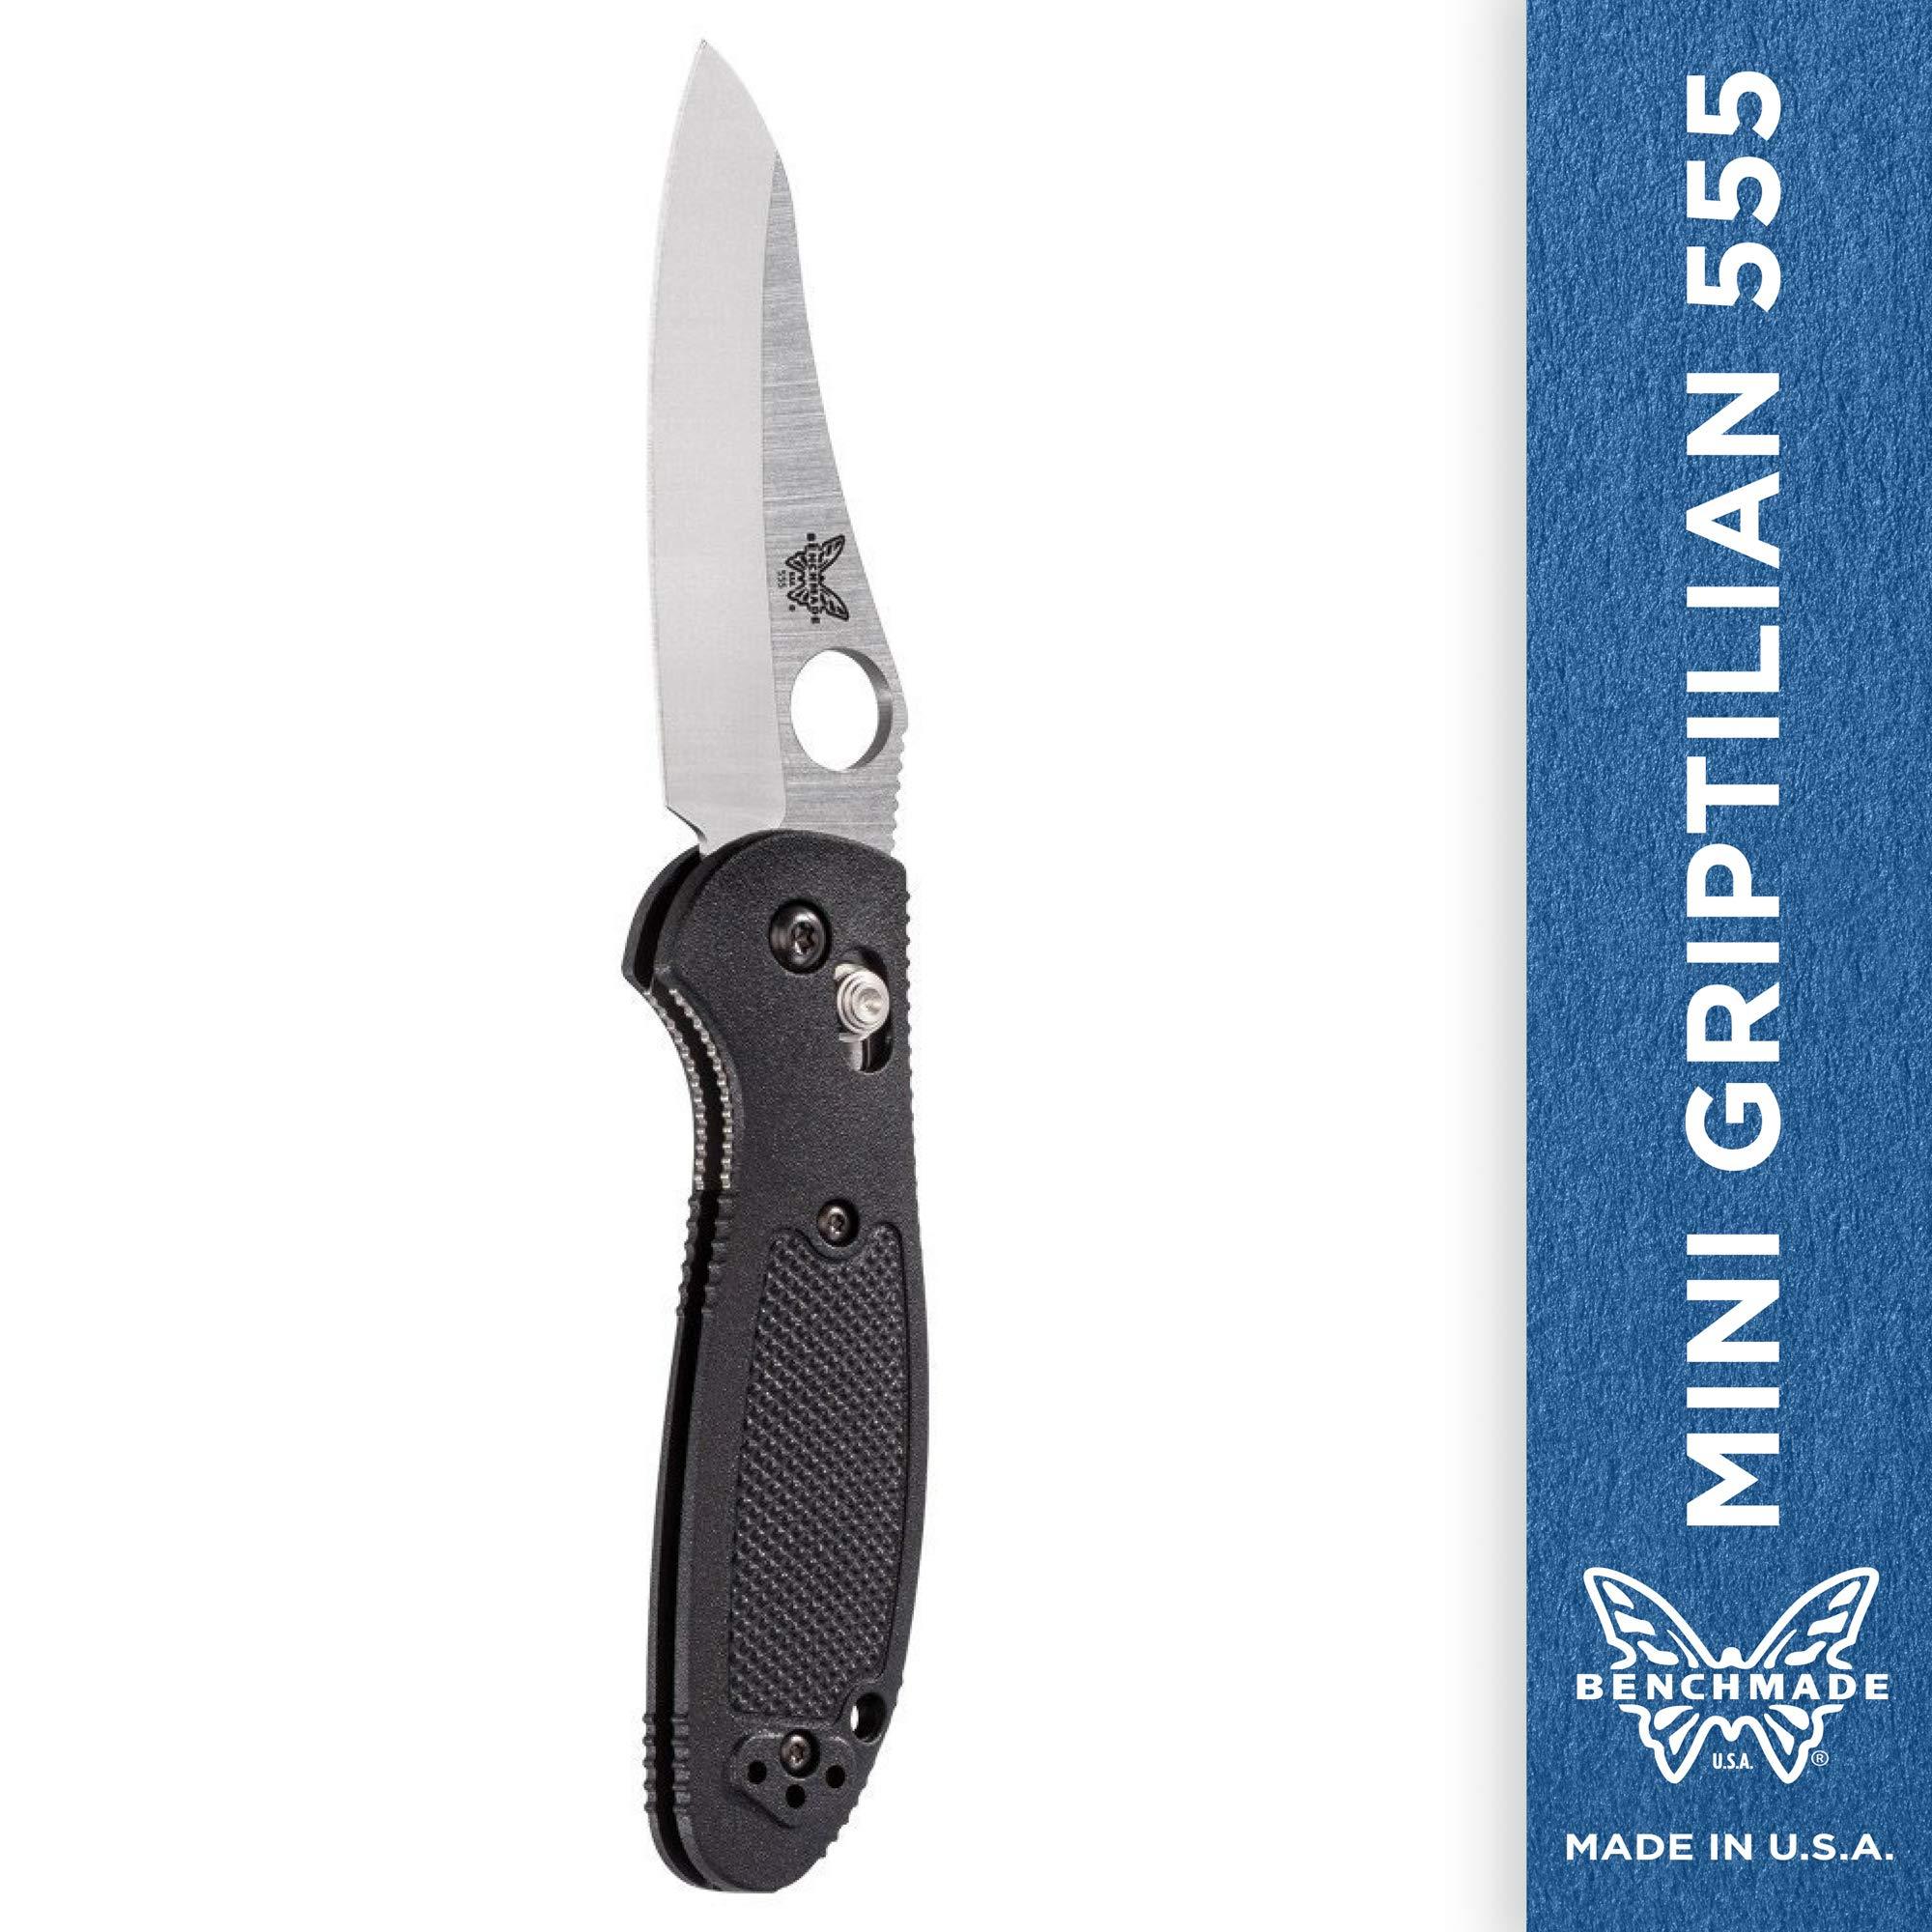 Benchmade Pardue Mini-griptilian 530v Steel Blade Knife - 555-s30v Satin Plain E by Benchmade